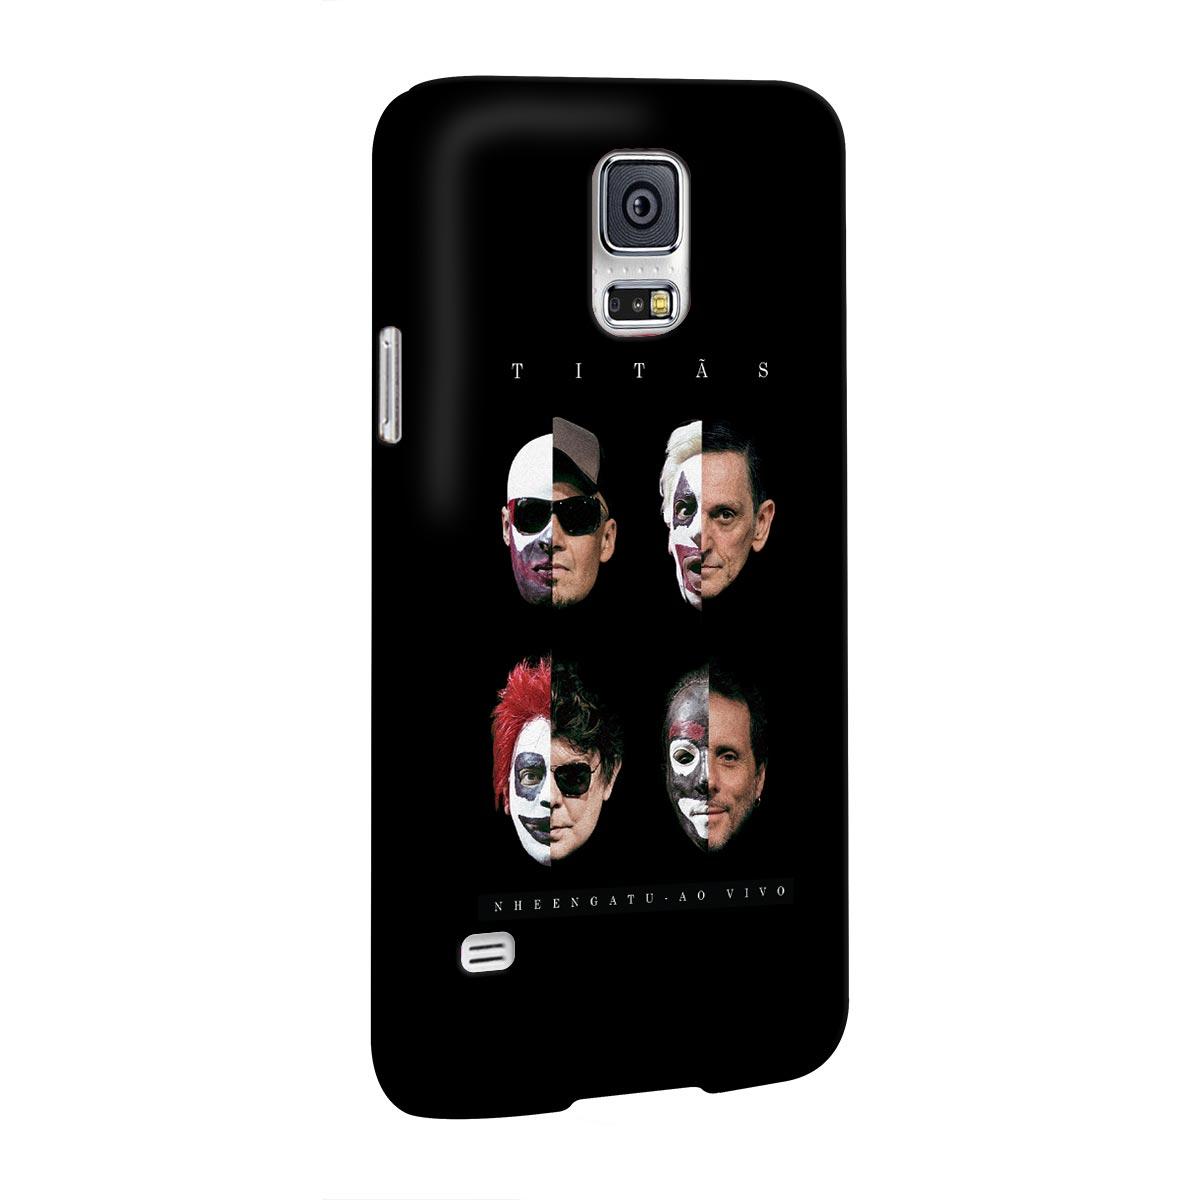 Capa para Samsung Galaxy S5 Titãs Capa Nheengatu Ao Vivo